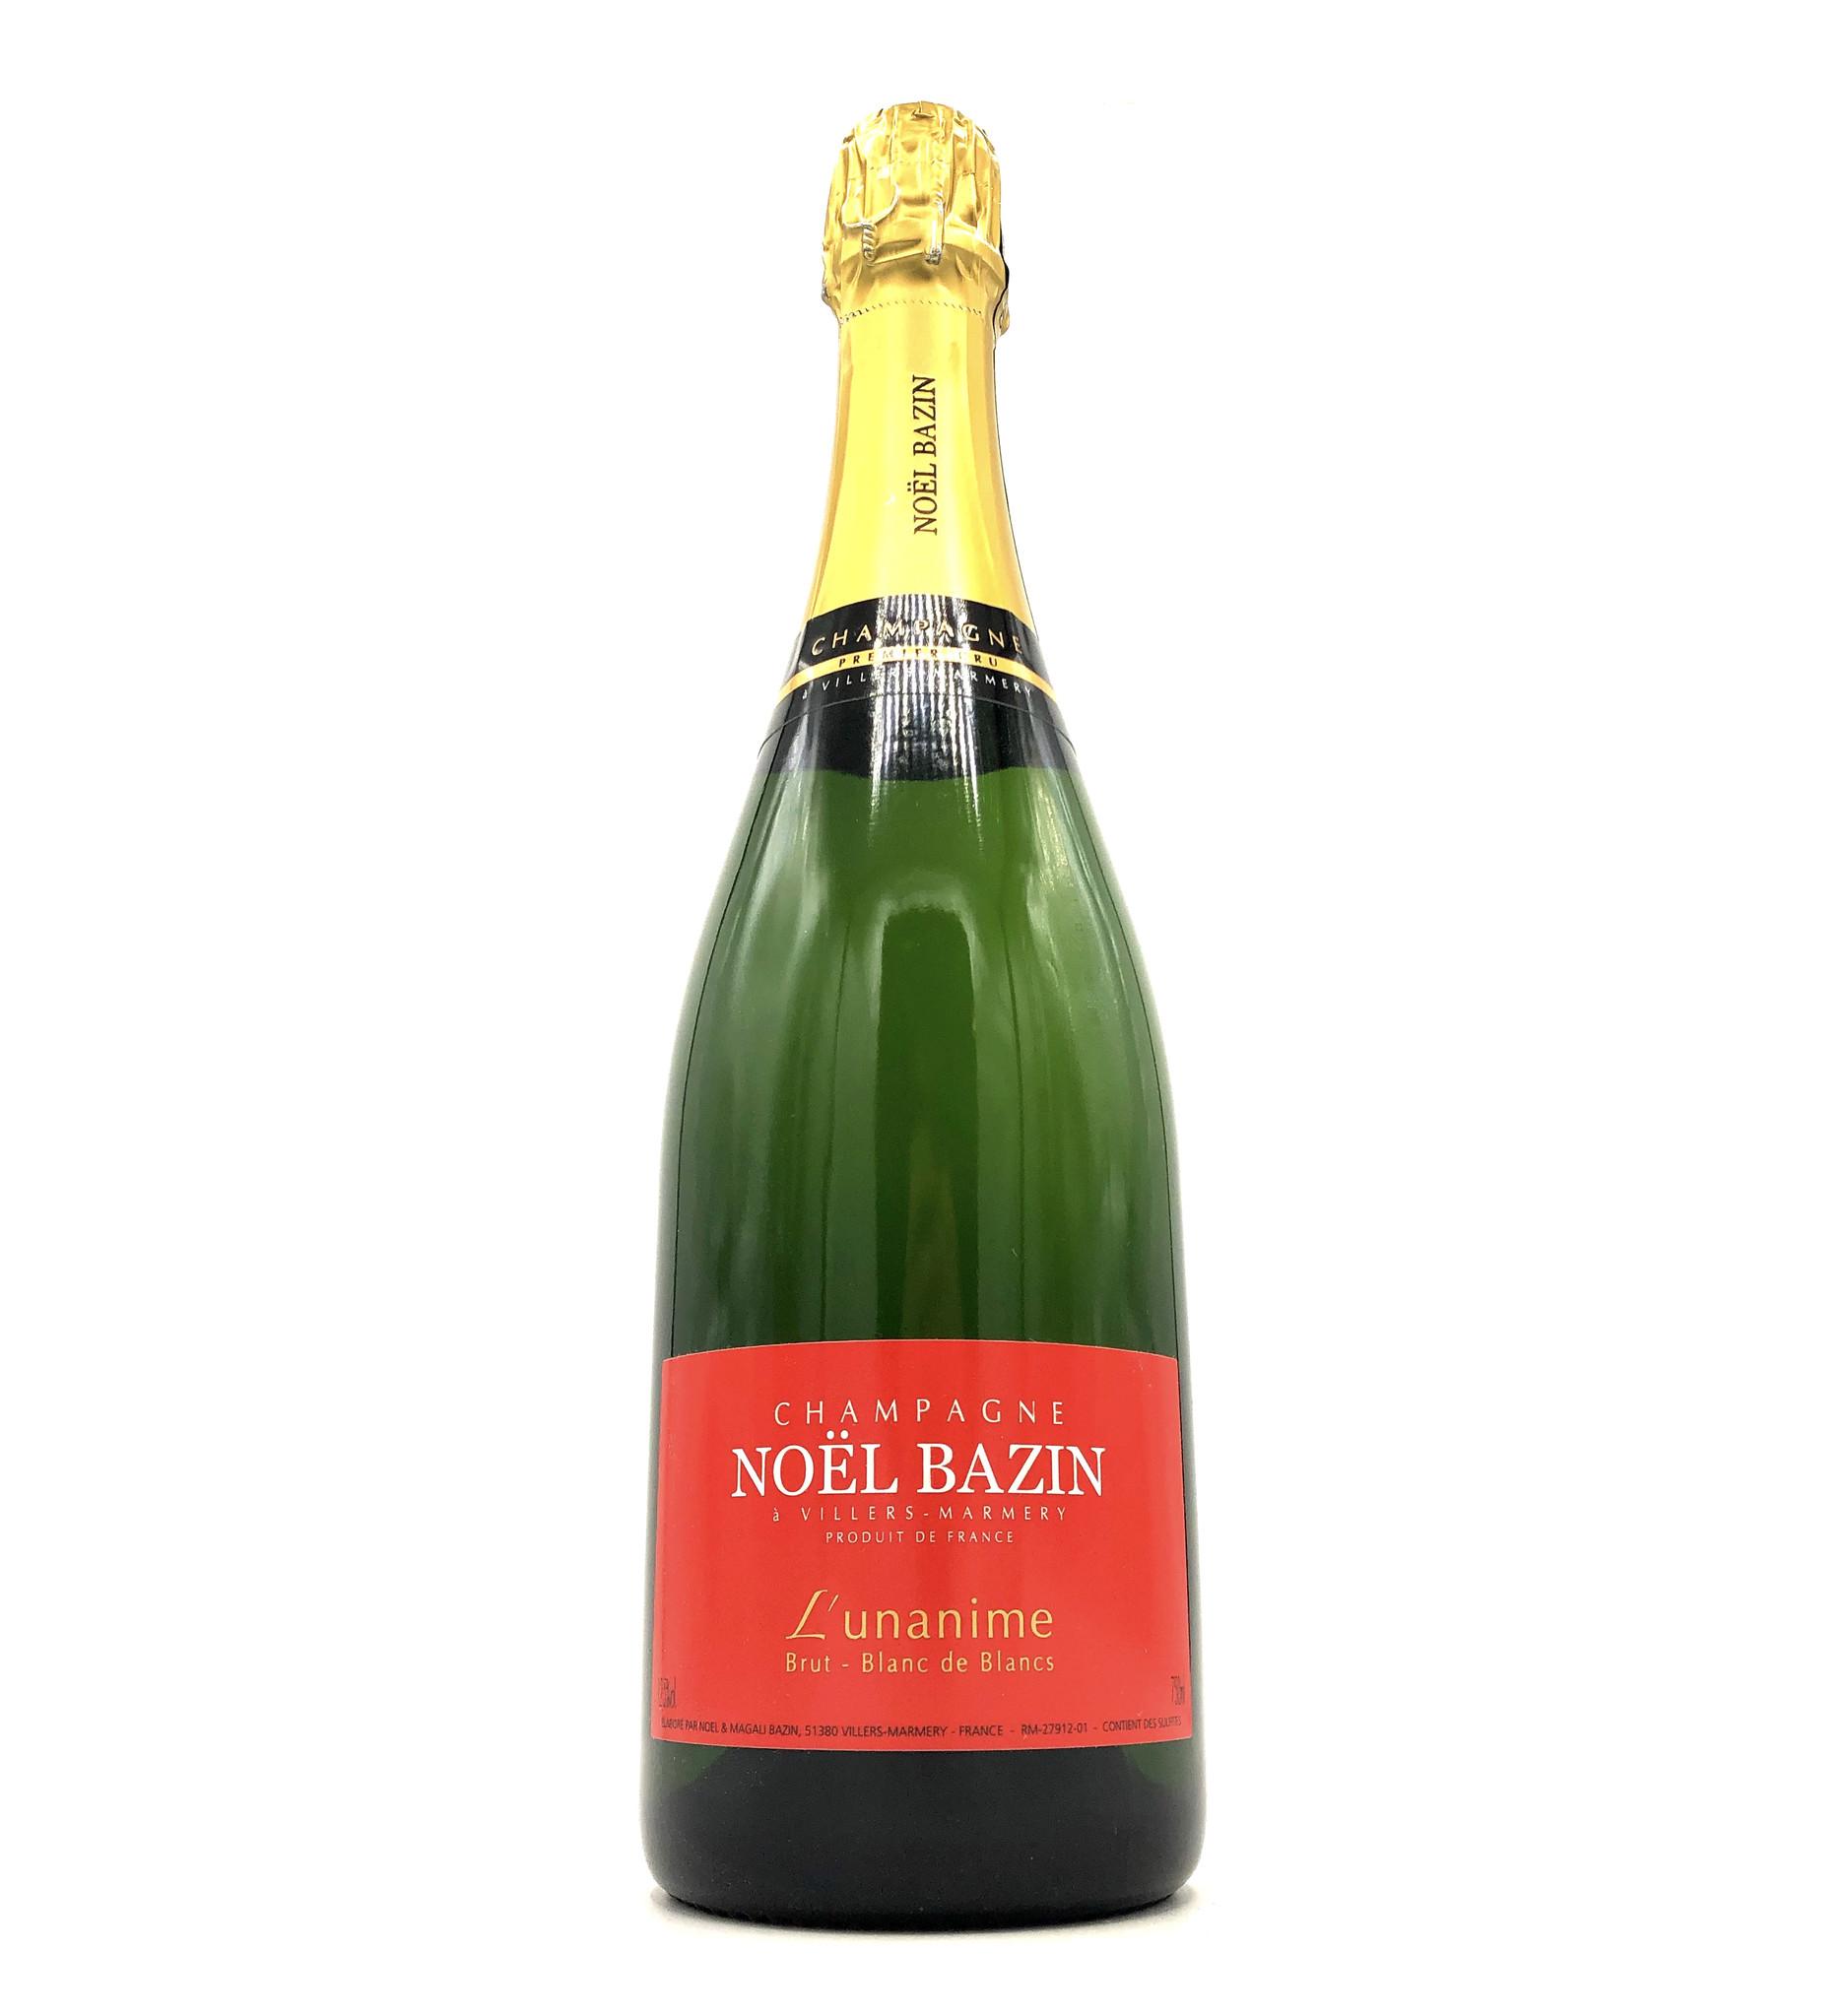 Champagne L'Unanime NV Noël Bazin